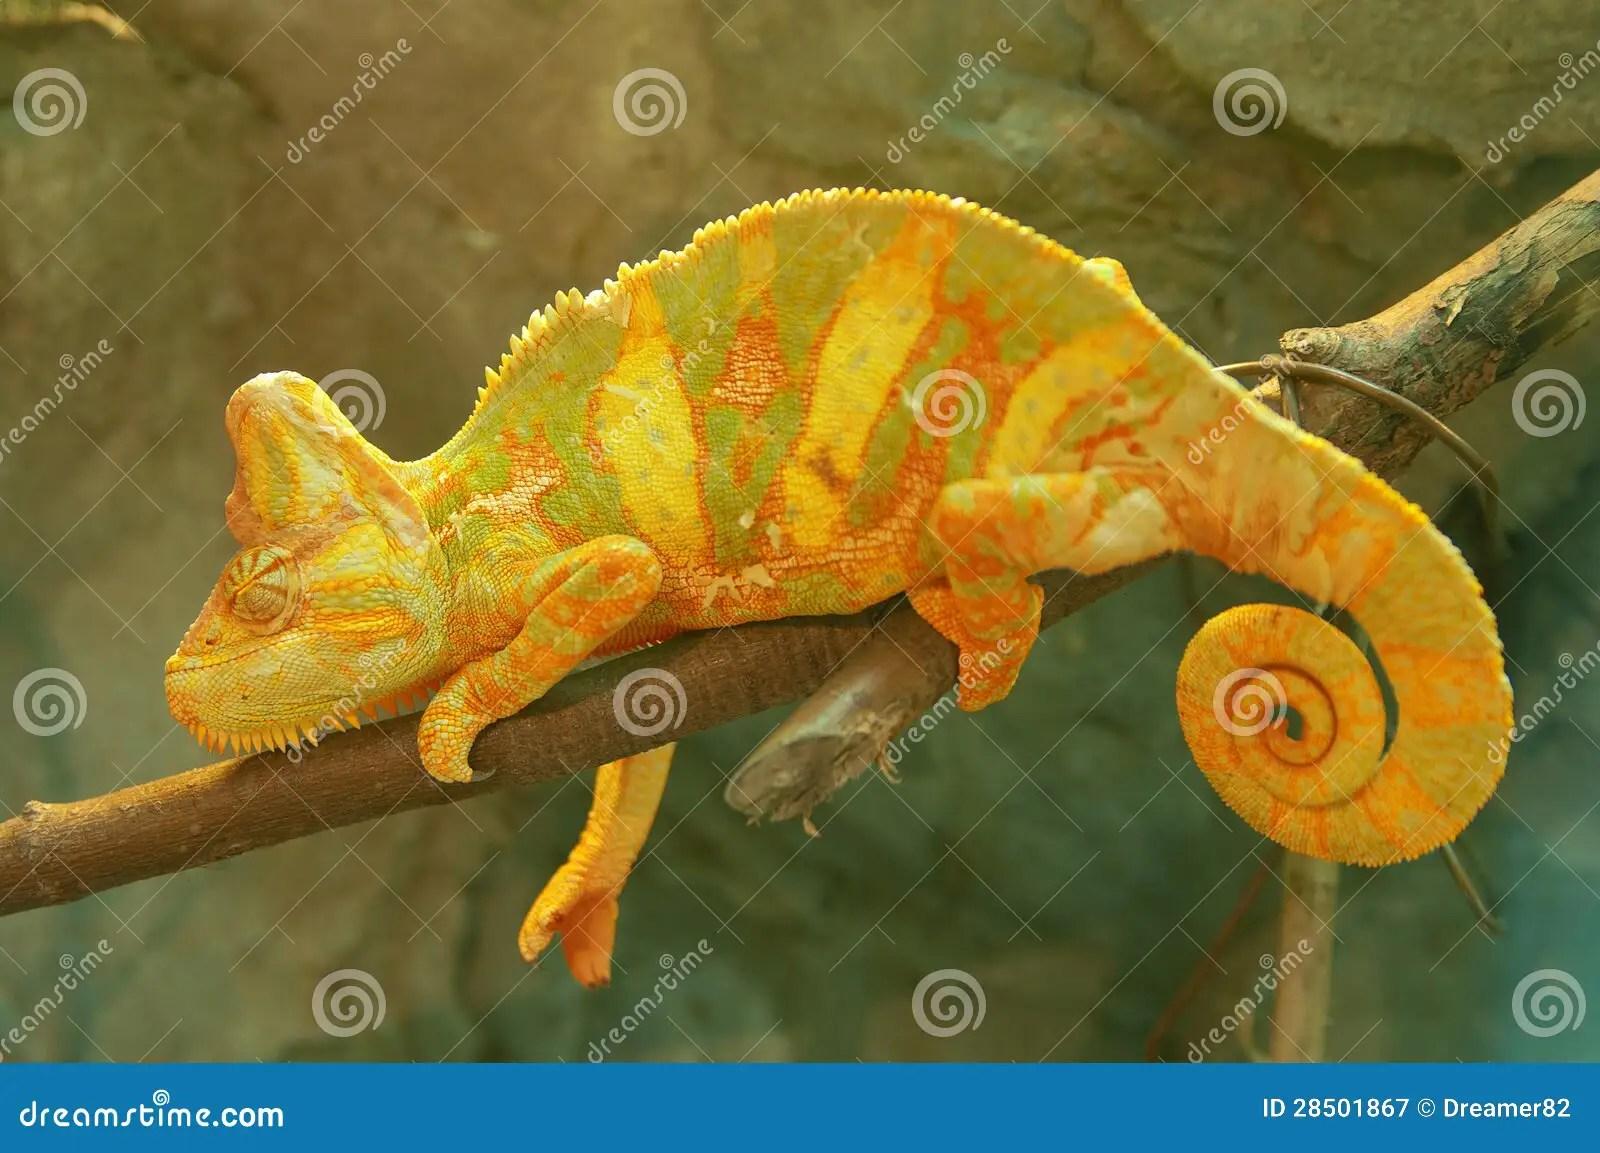 Yellow Green Chameleon